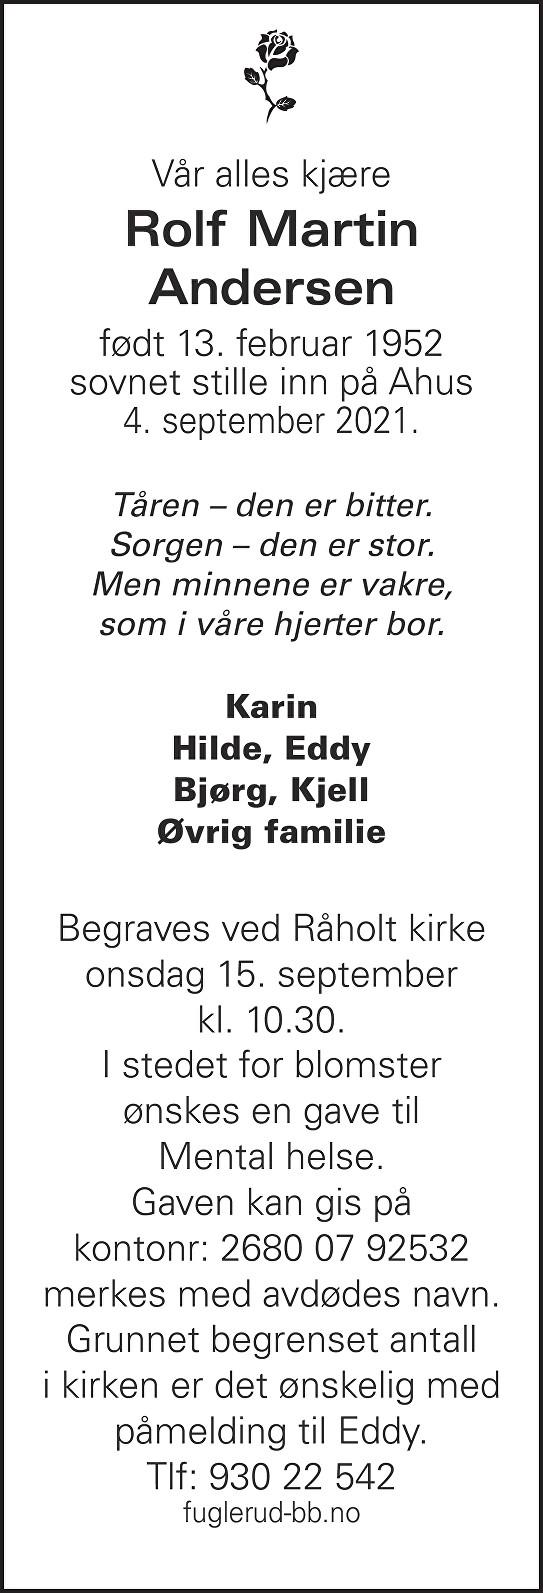 Rolf Martin Andersen Dødsannonse